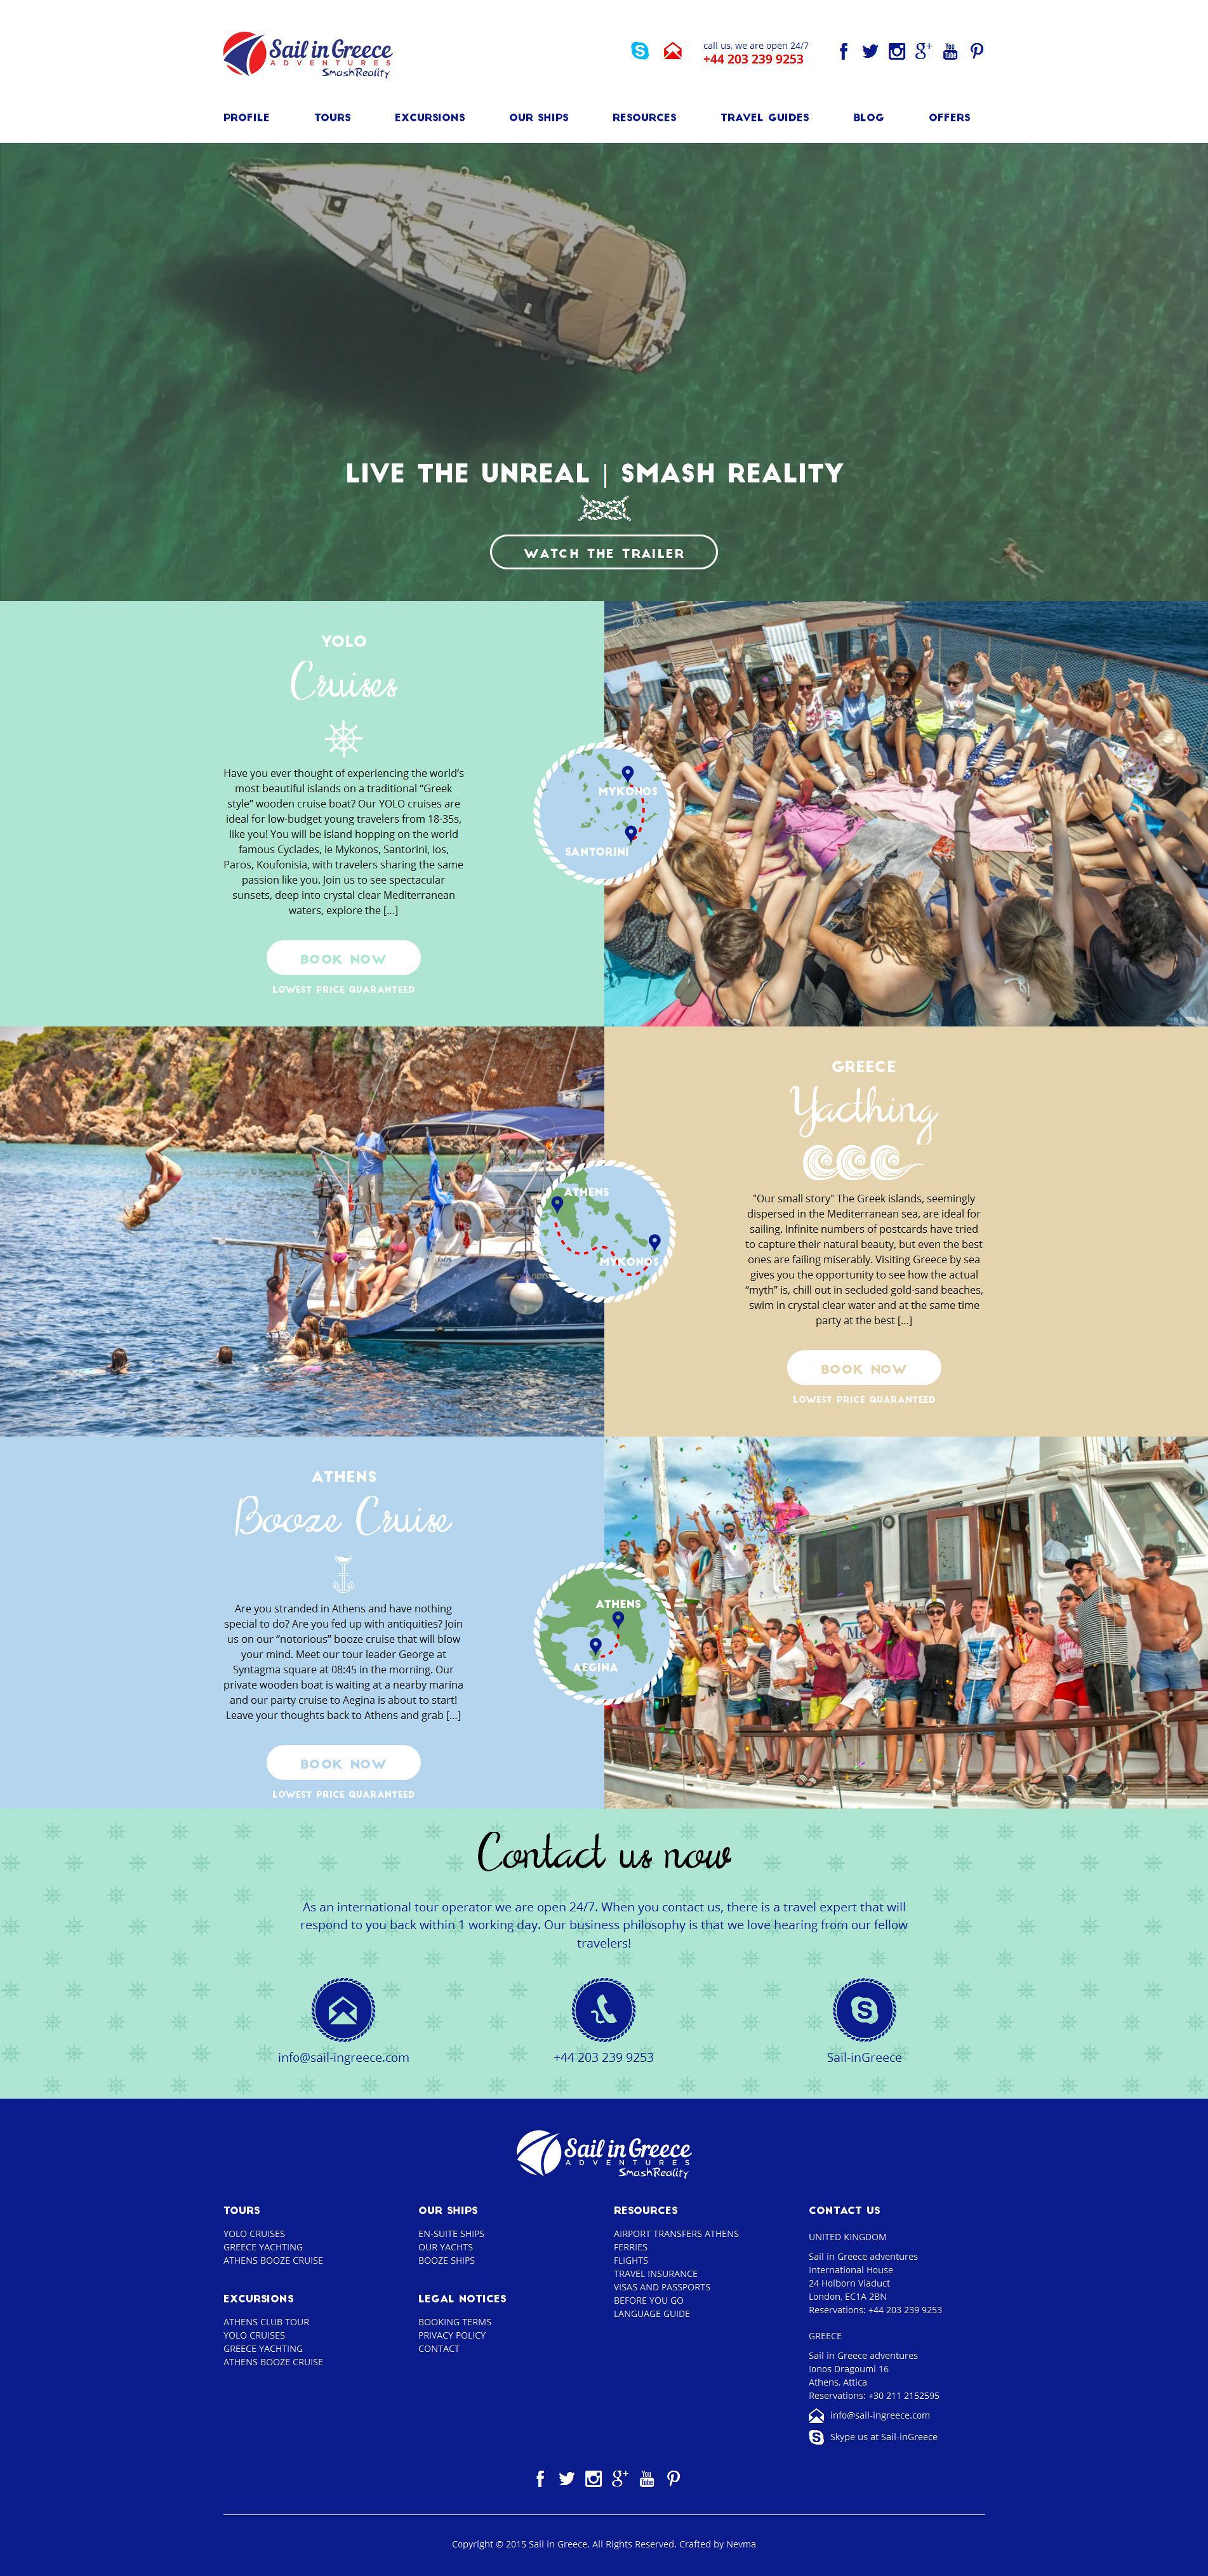 SailInGreece - κατασκευή ιστοσελίδων Nevma